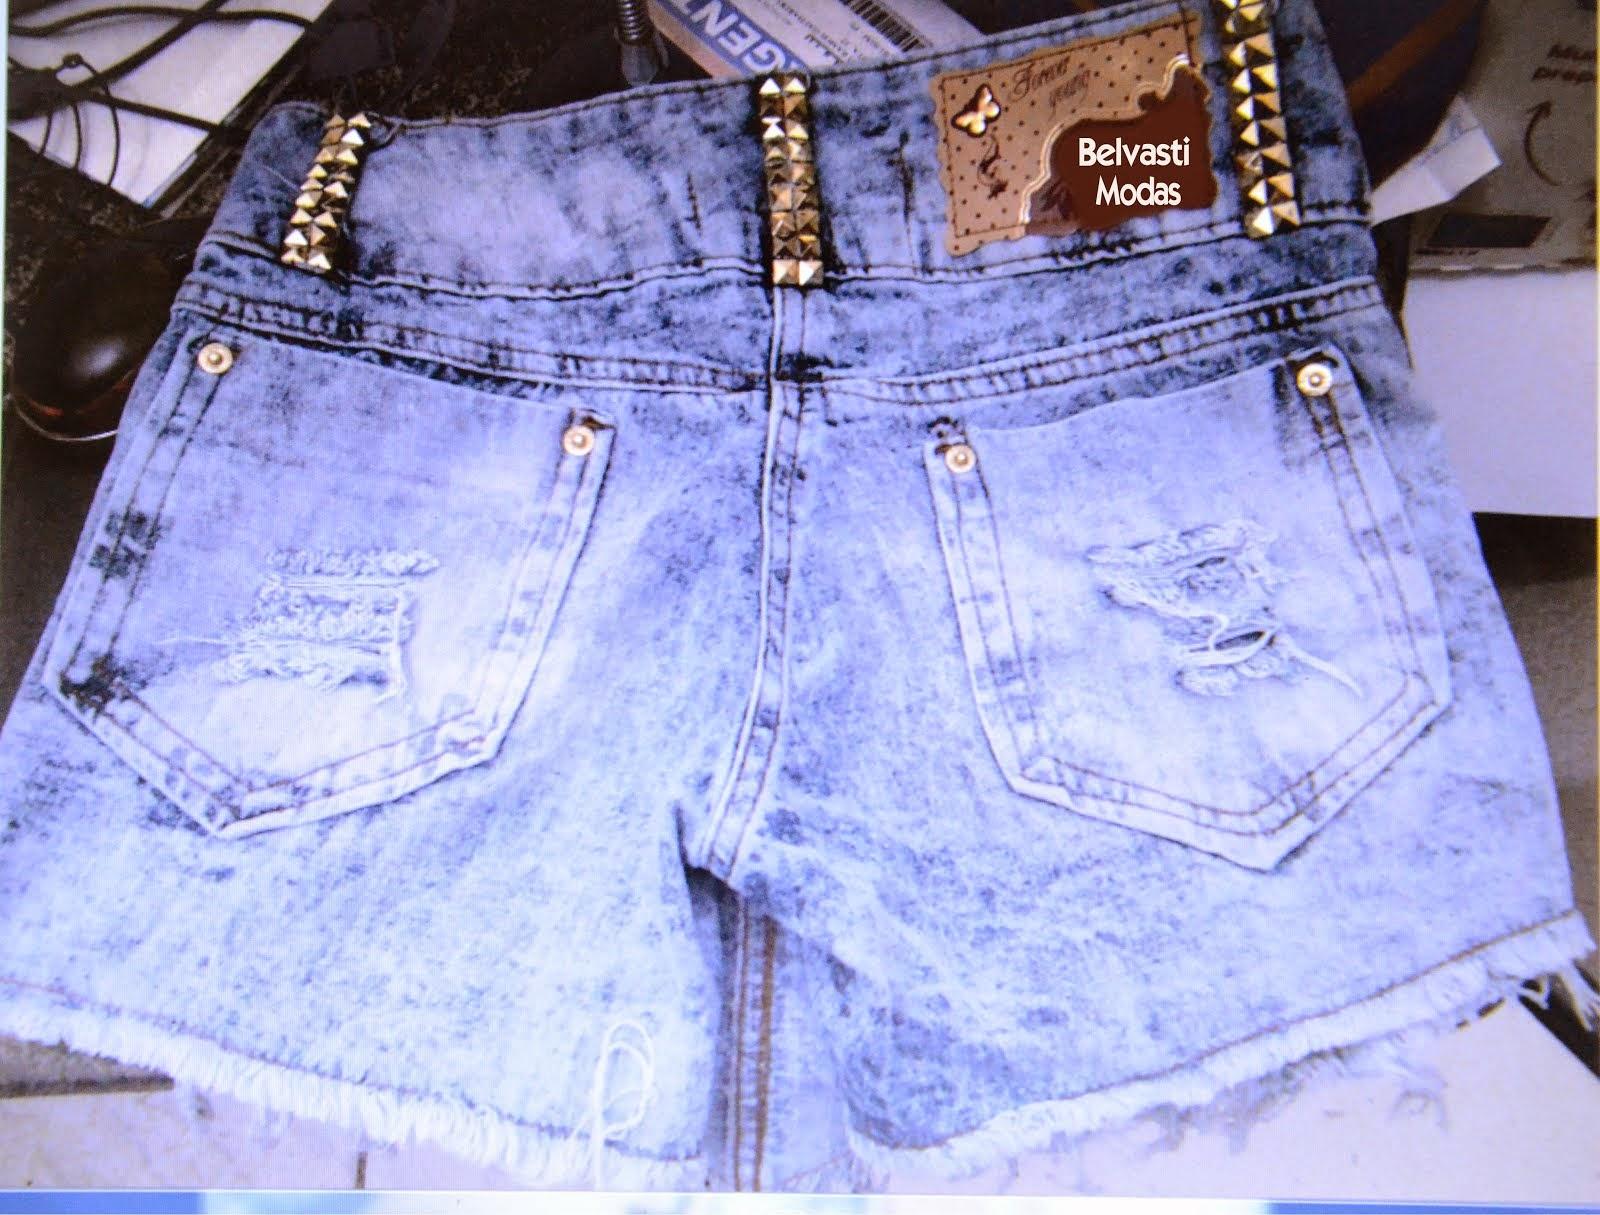 Belvasti Jeans Moda